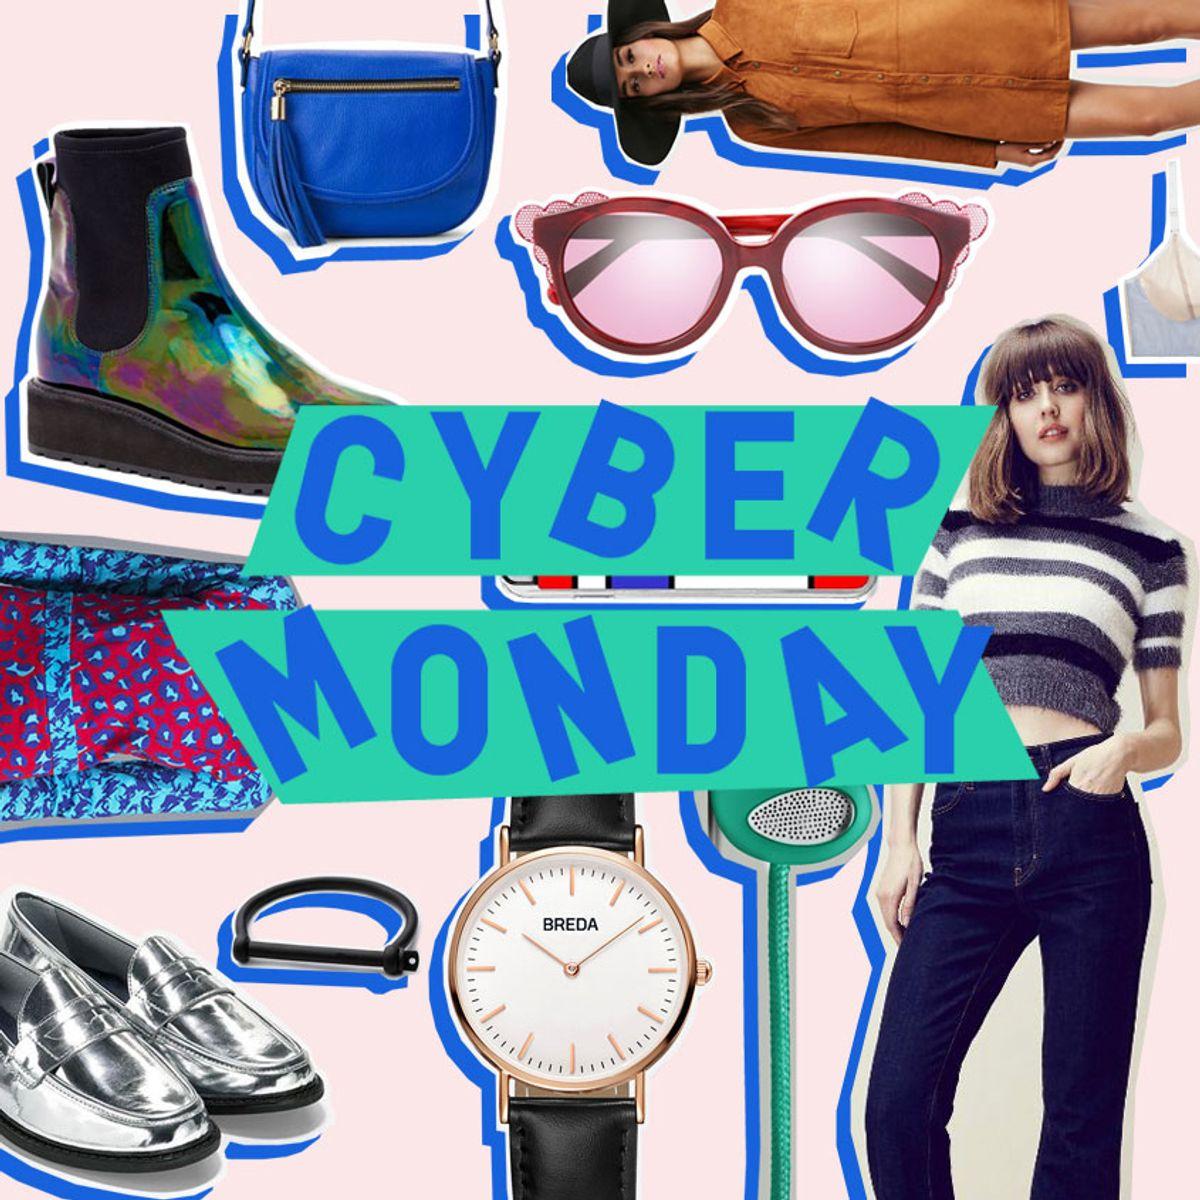 Our Favorite Cyber Monday Deals